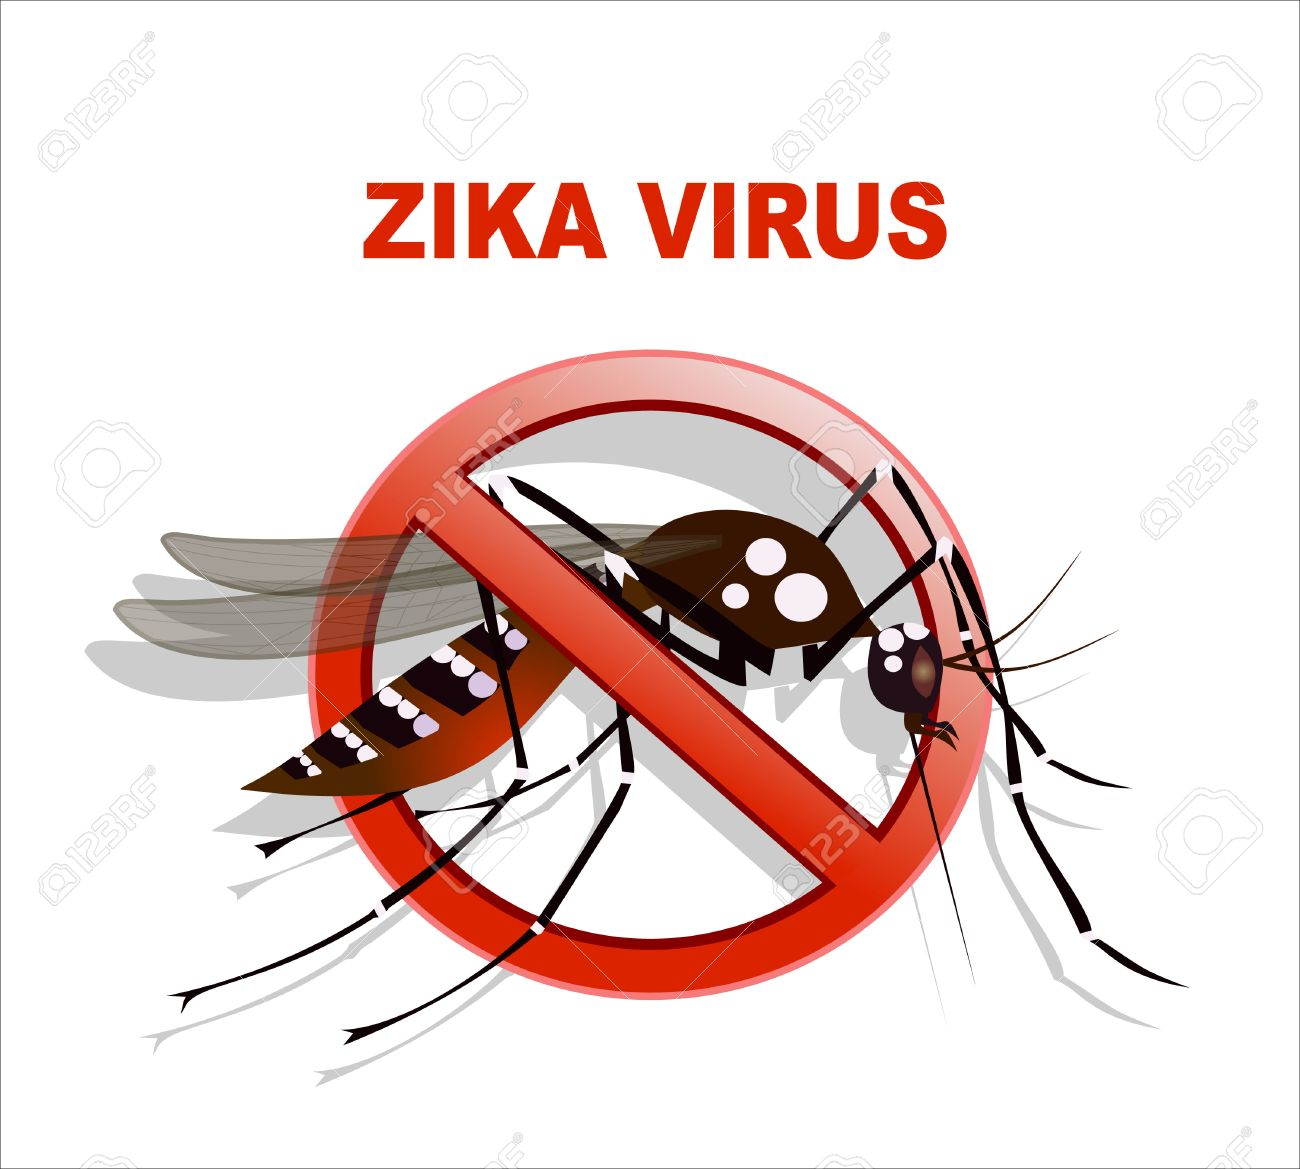 Caution of mosquito icon, spread of zika and dengue virus. Vector Design - 52780011